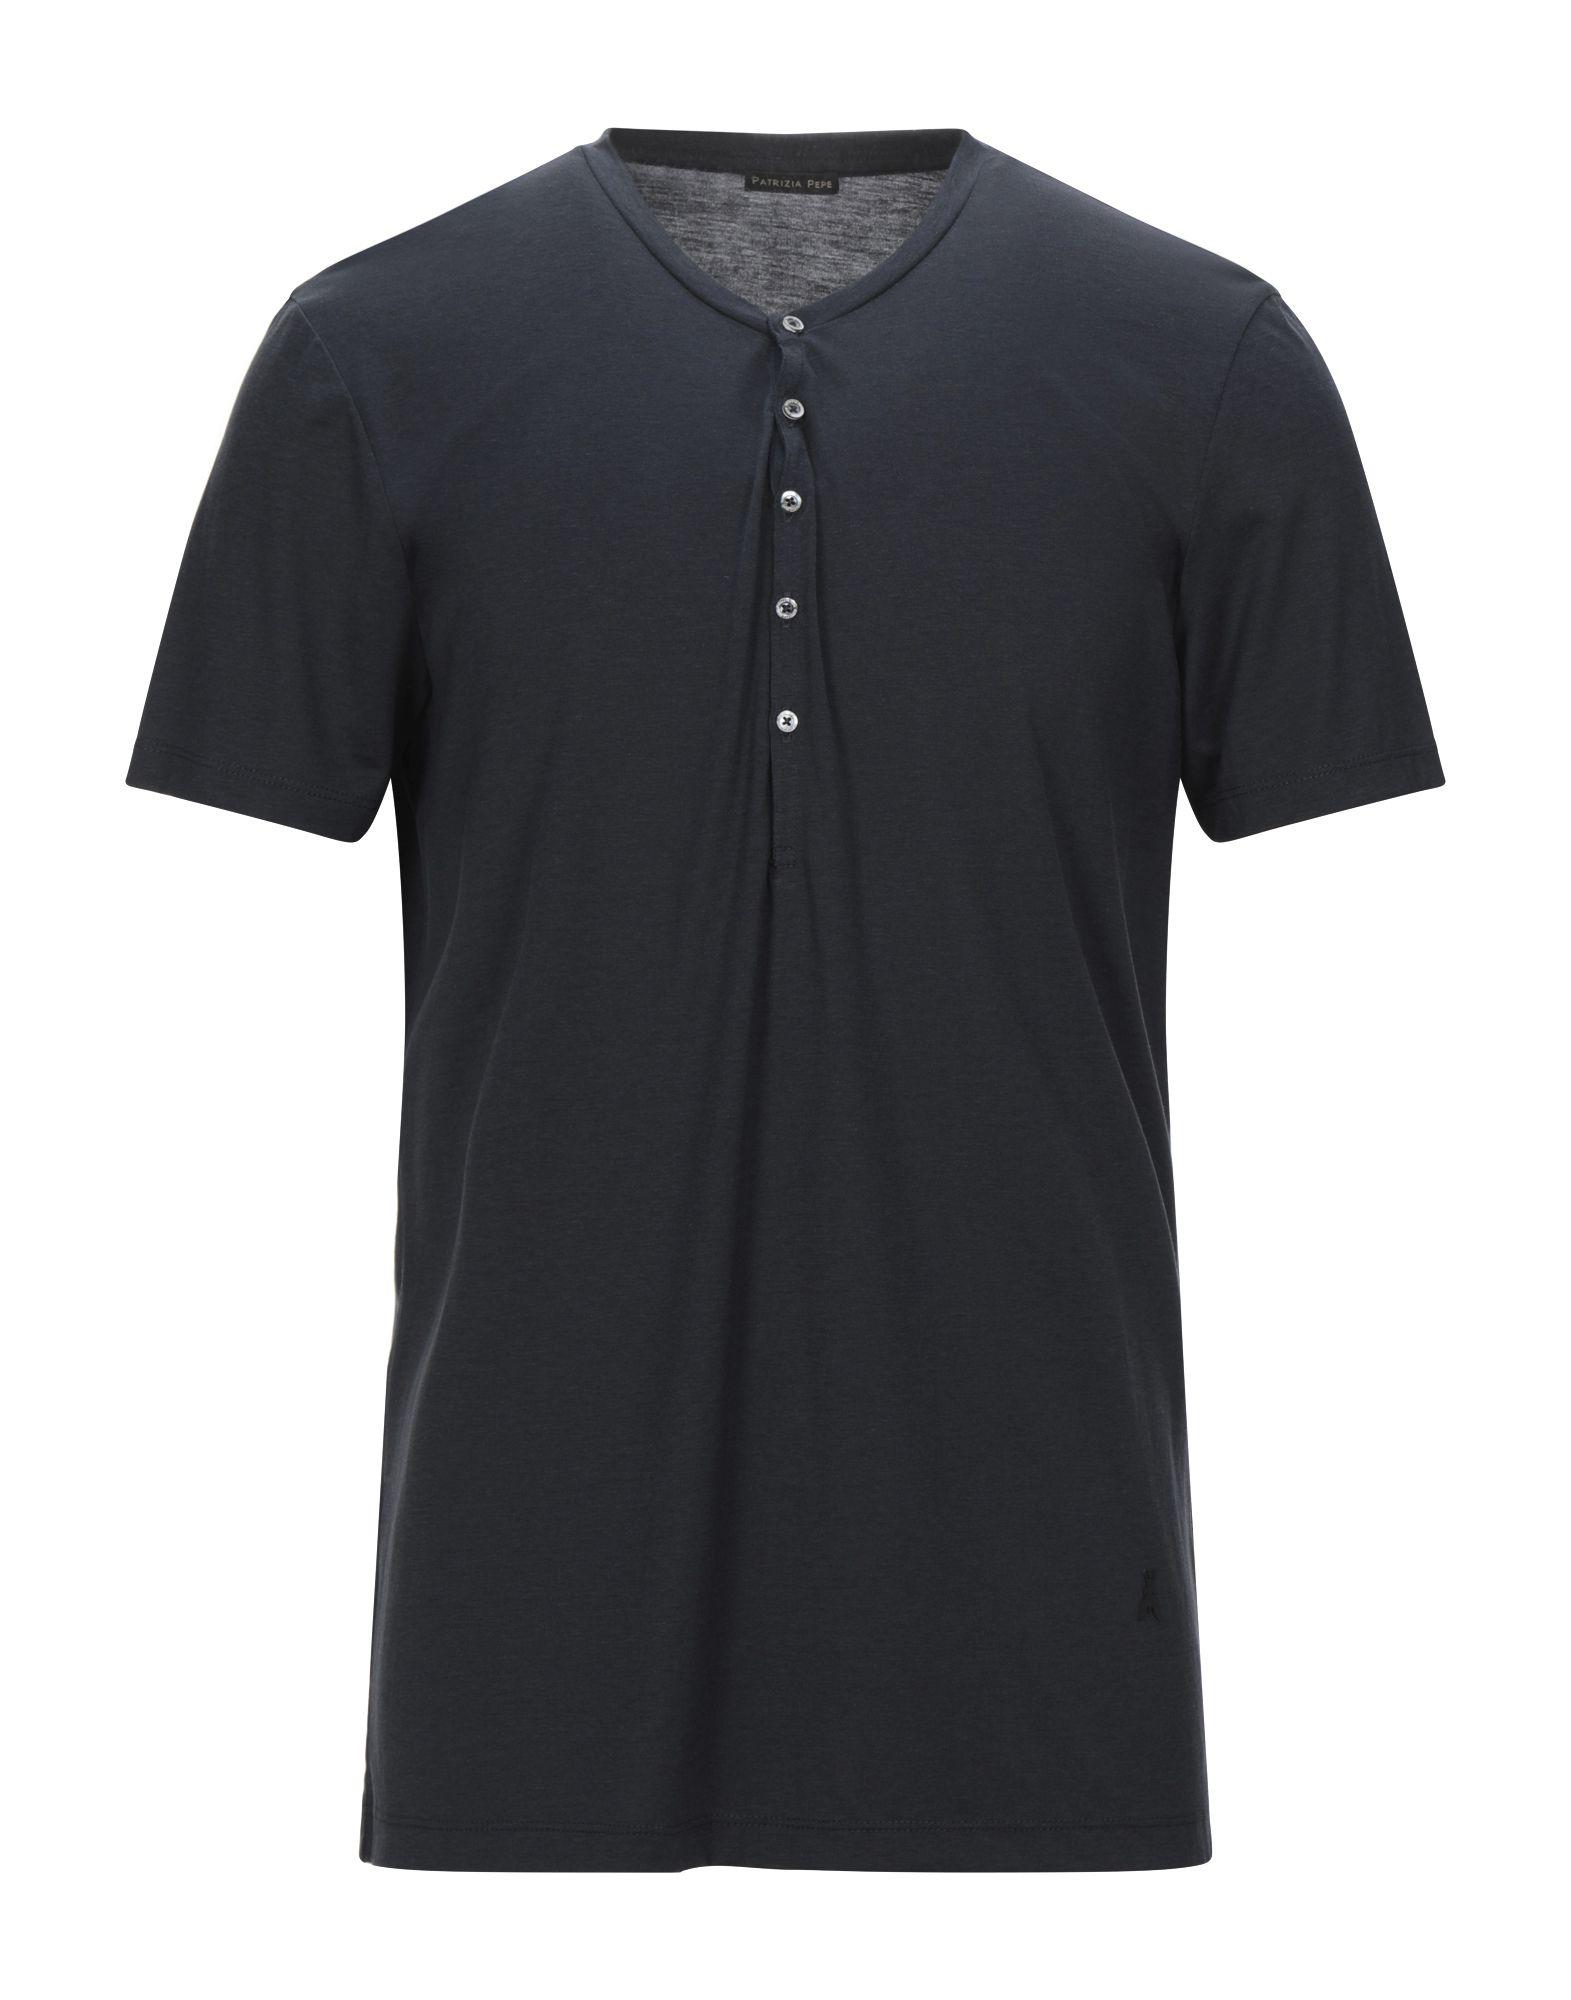 PATRIZIA PEPE T-shirts - Item 12503382